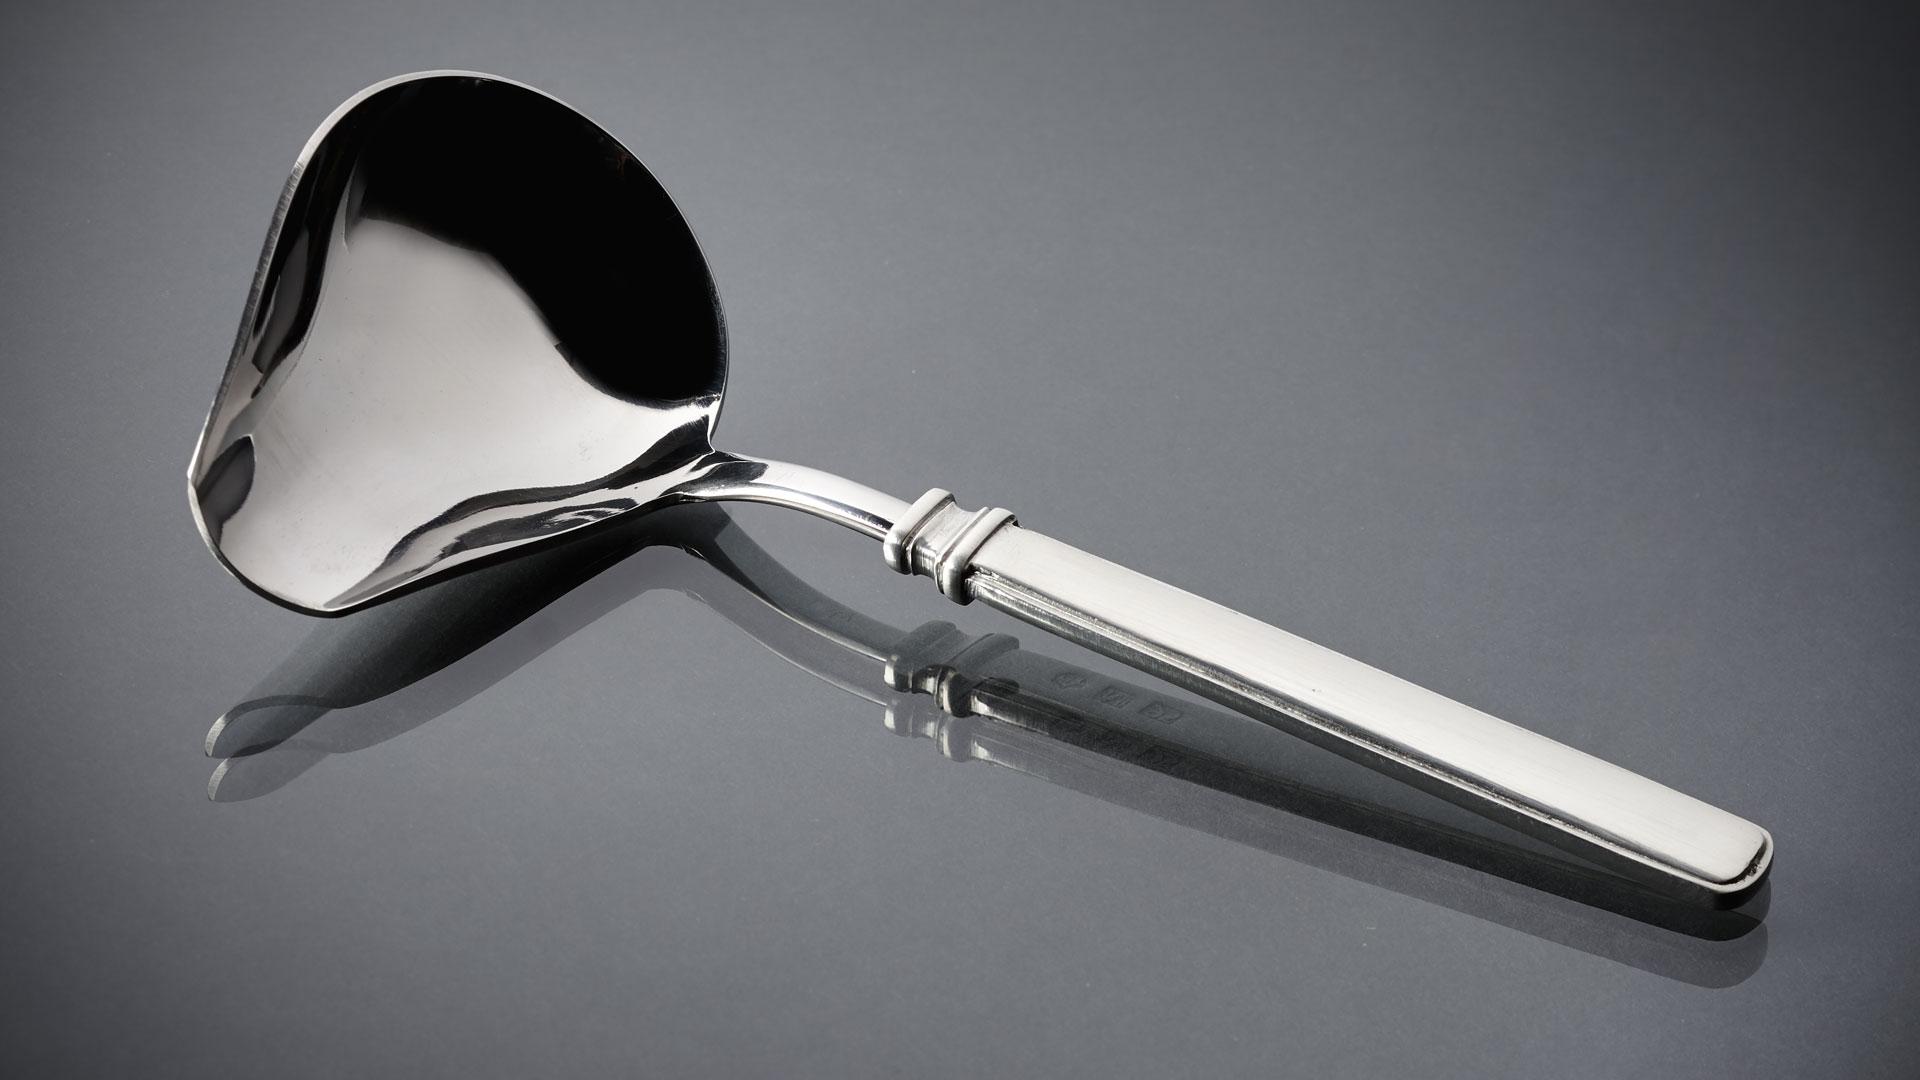 Фото ложки для соуса